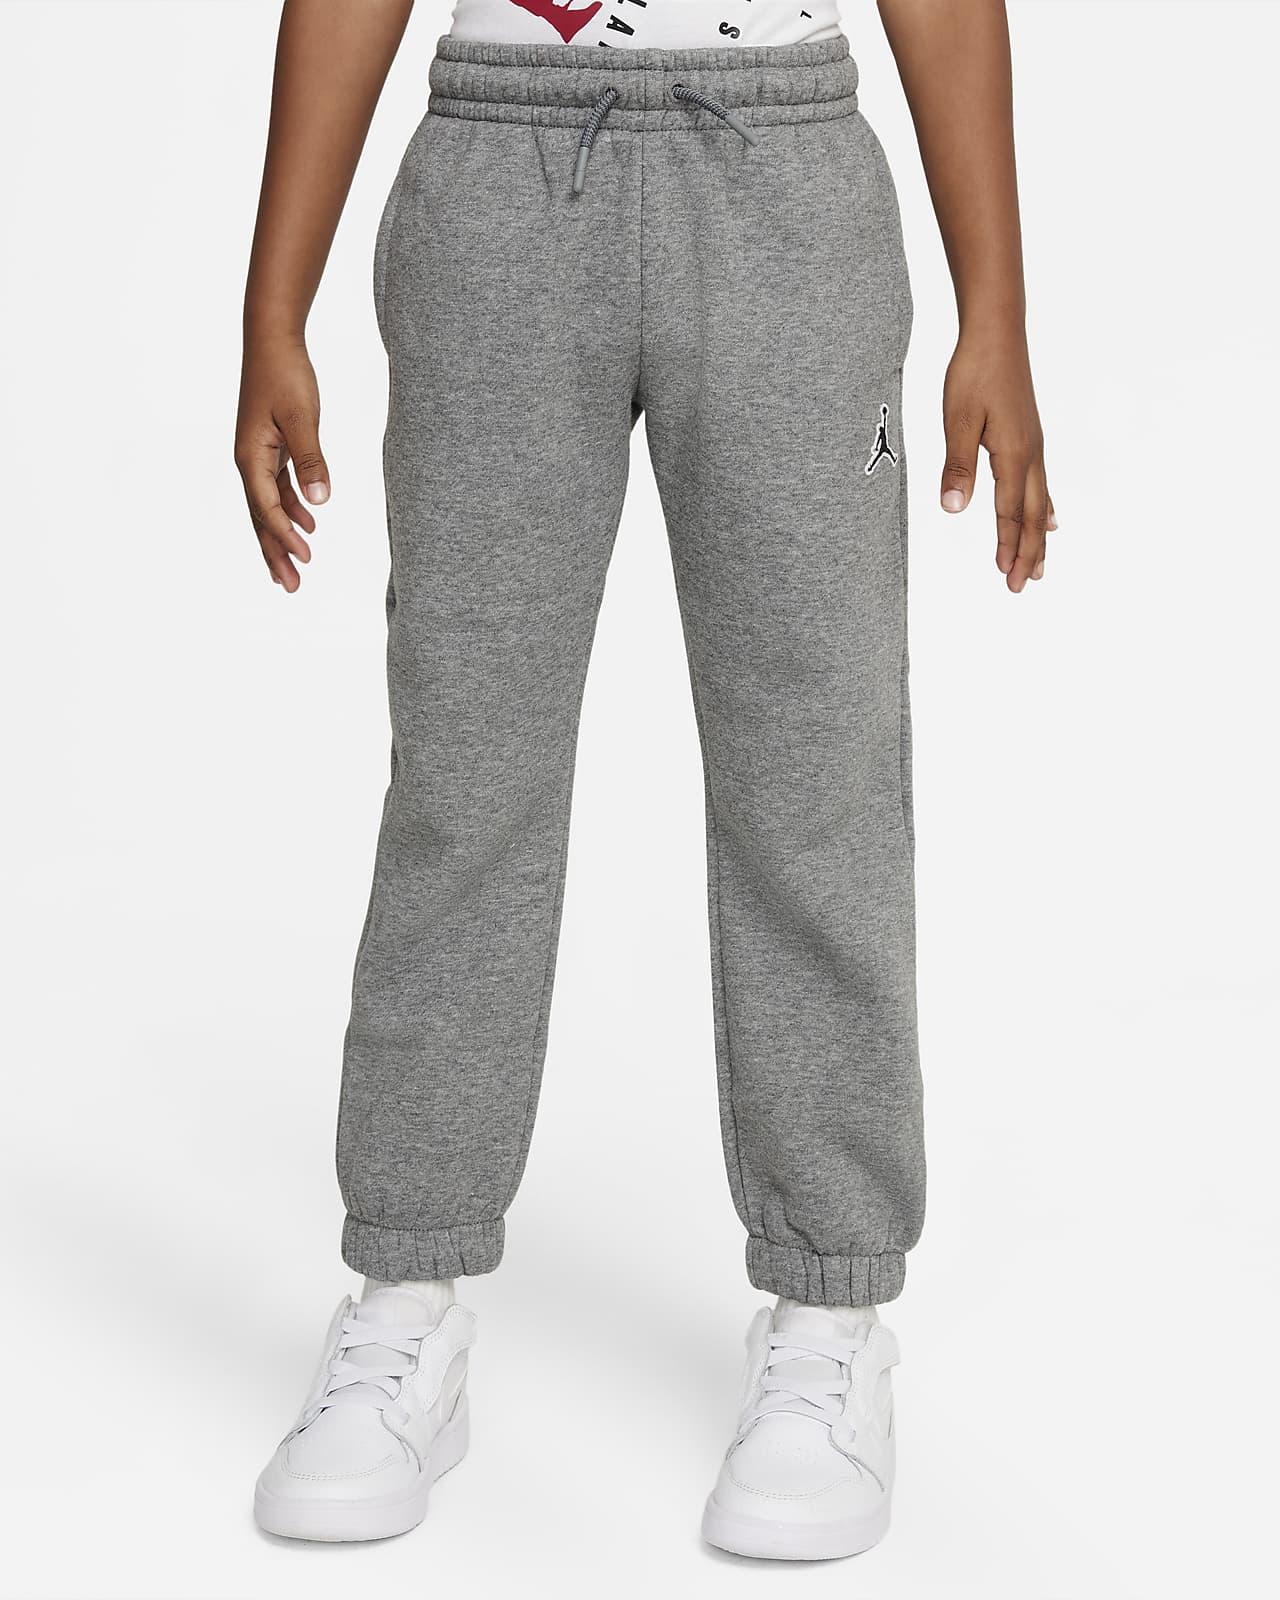 Jordan Pantalons - Nen/a petit/a